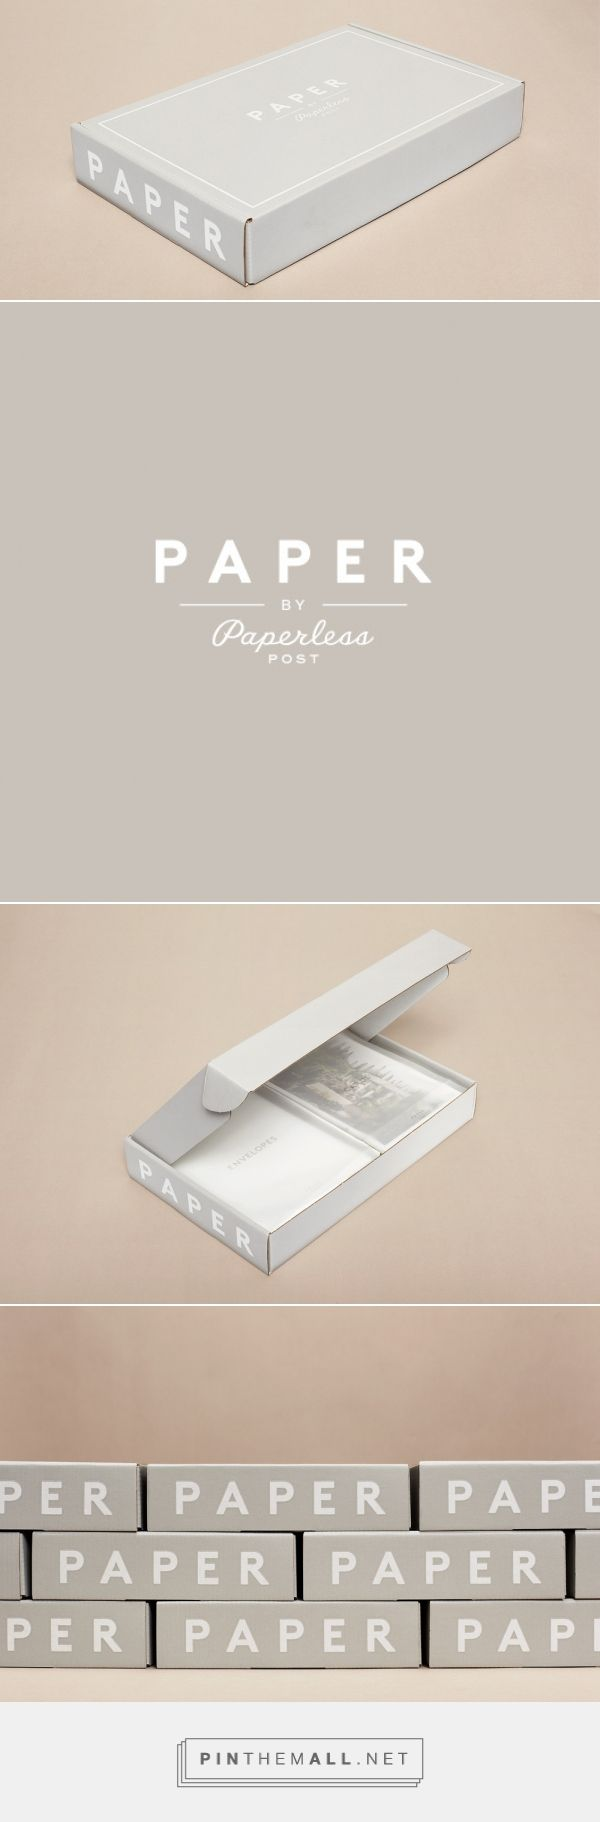 Paperless Post — The Dieline - Branding & Packaging Design - created via https://pinthemall.net